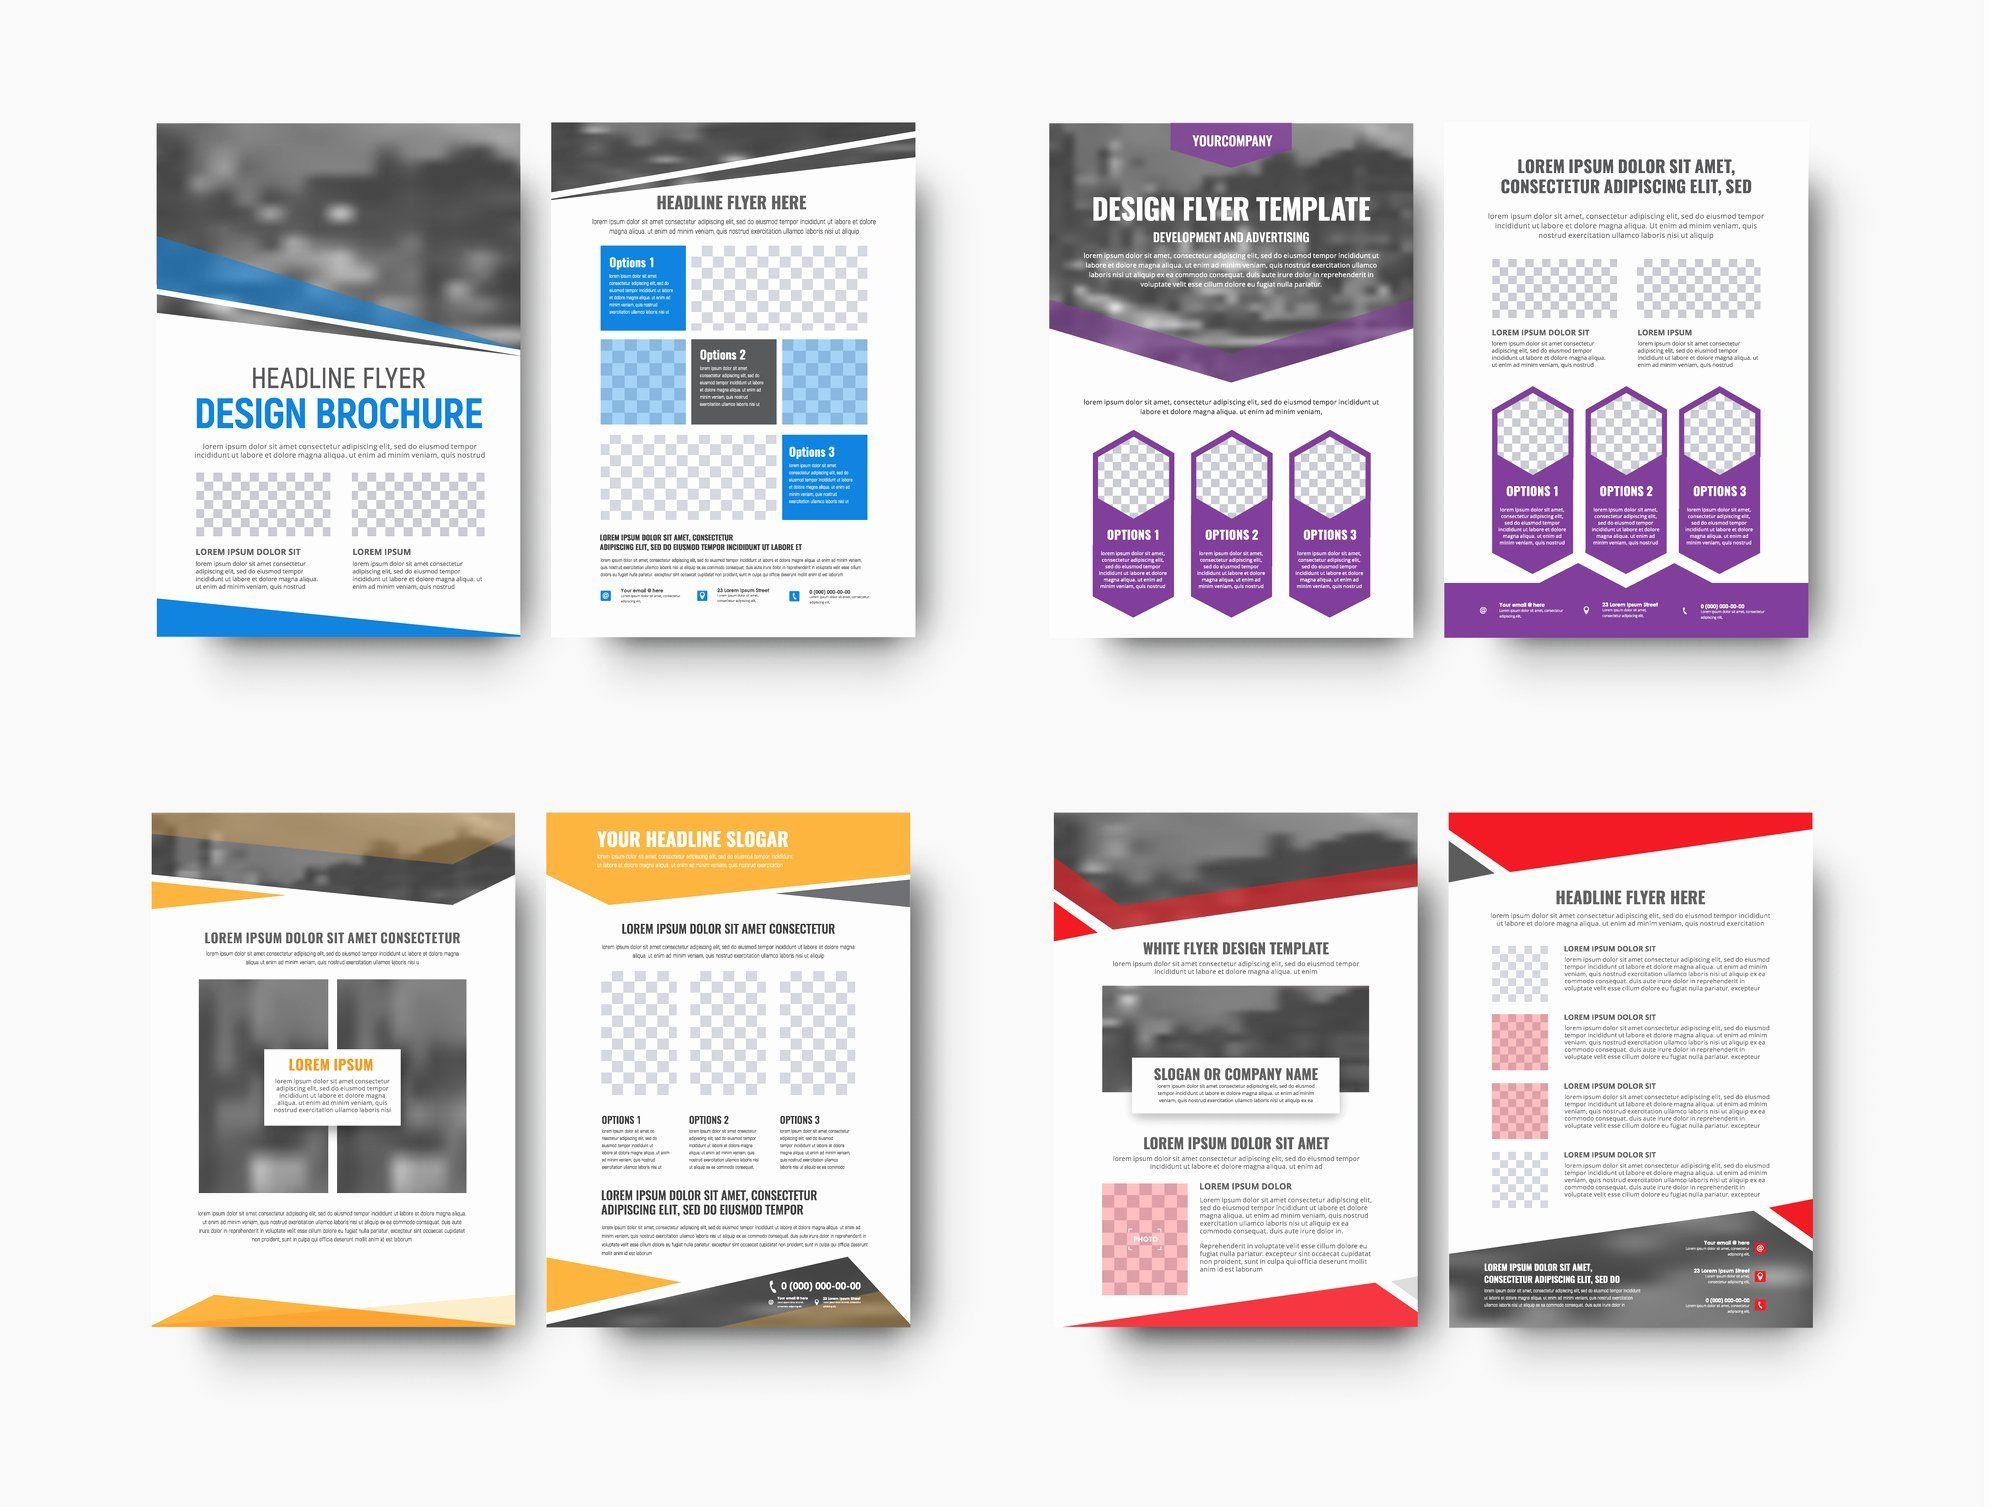 Ms Publisher Brochure Template Awesome Desktop Publishing Flyer Template Brochure Template Flyer Design Templates